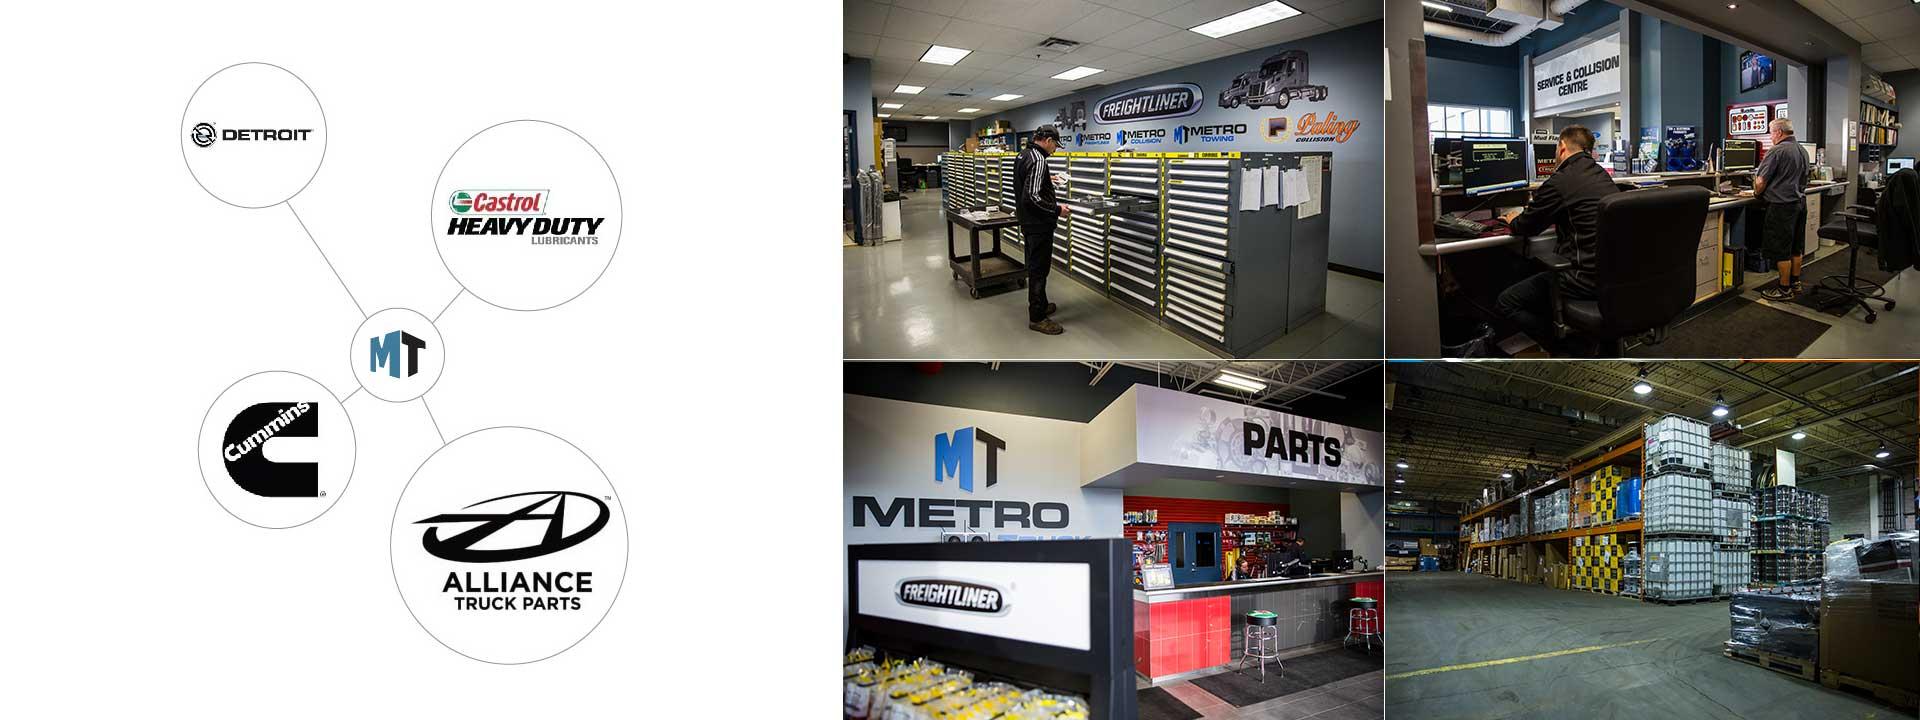 Metro Parts